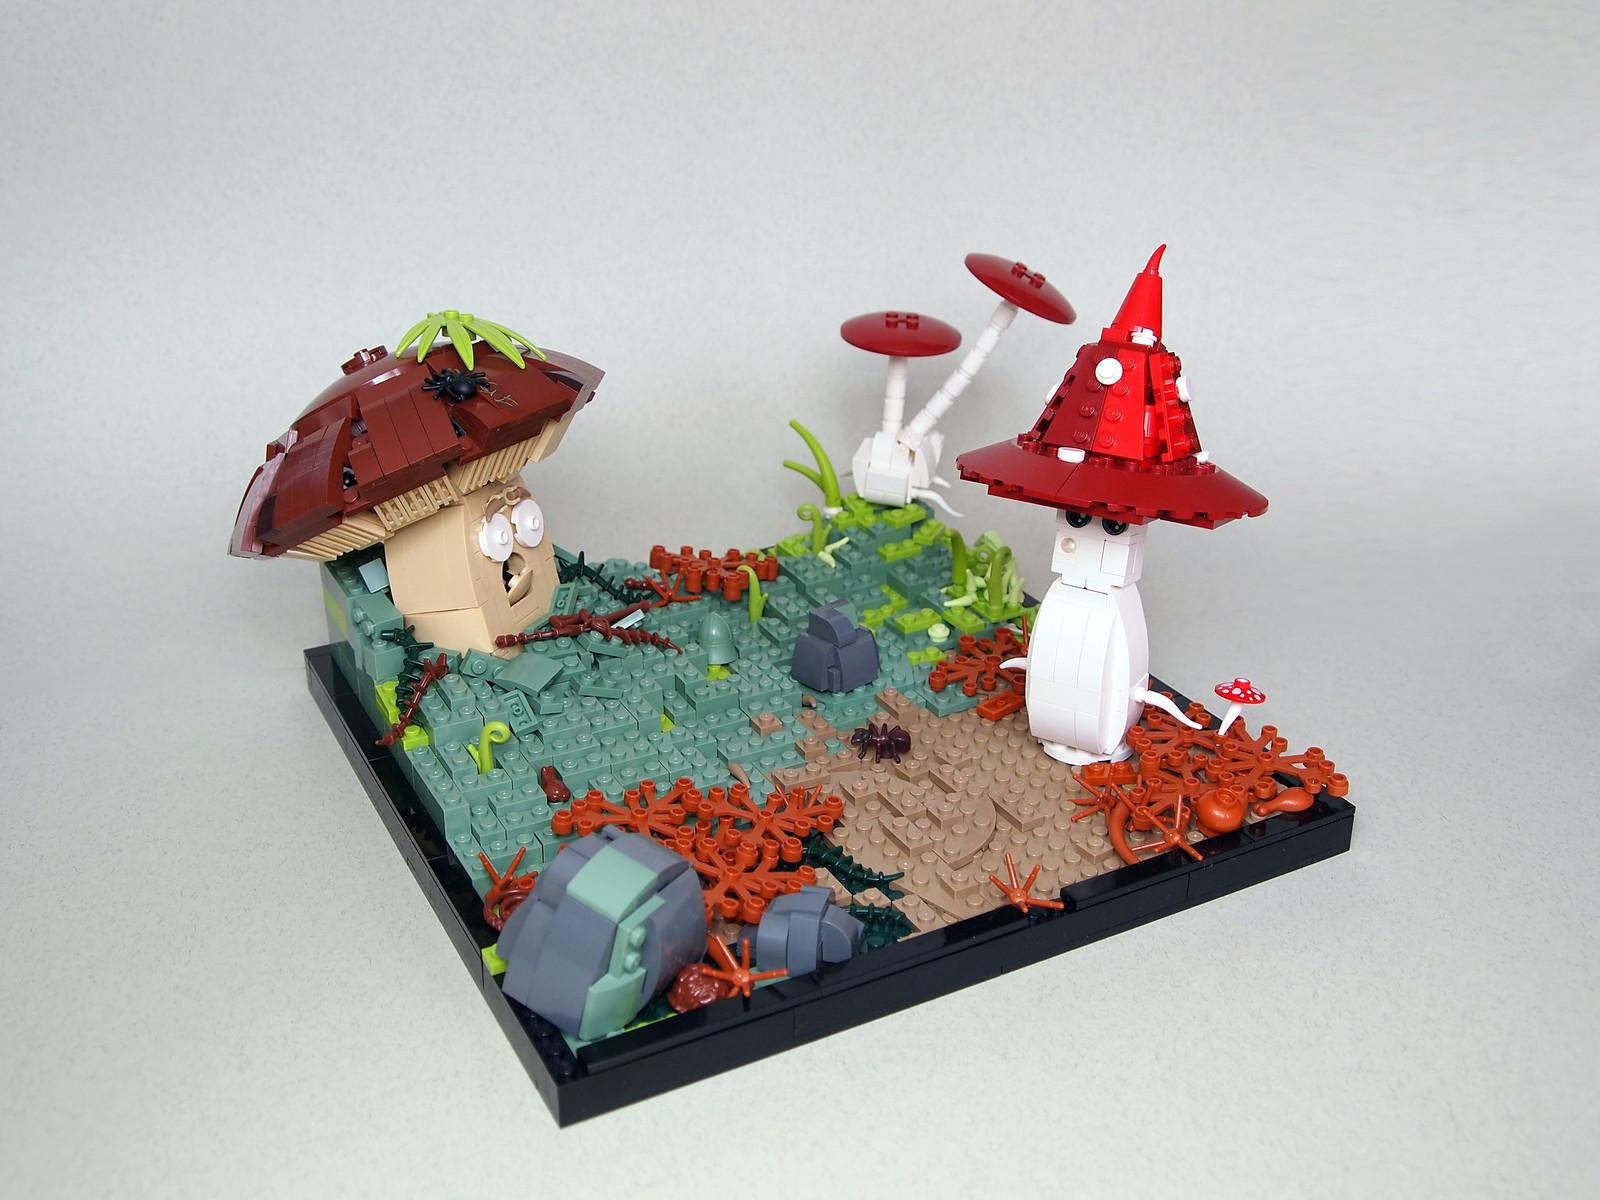 лего самоделка грибы